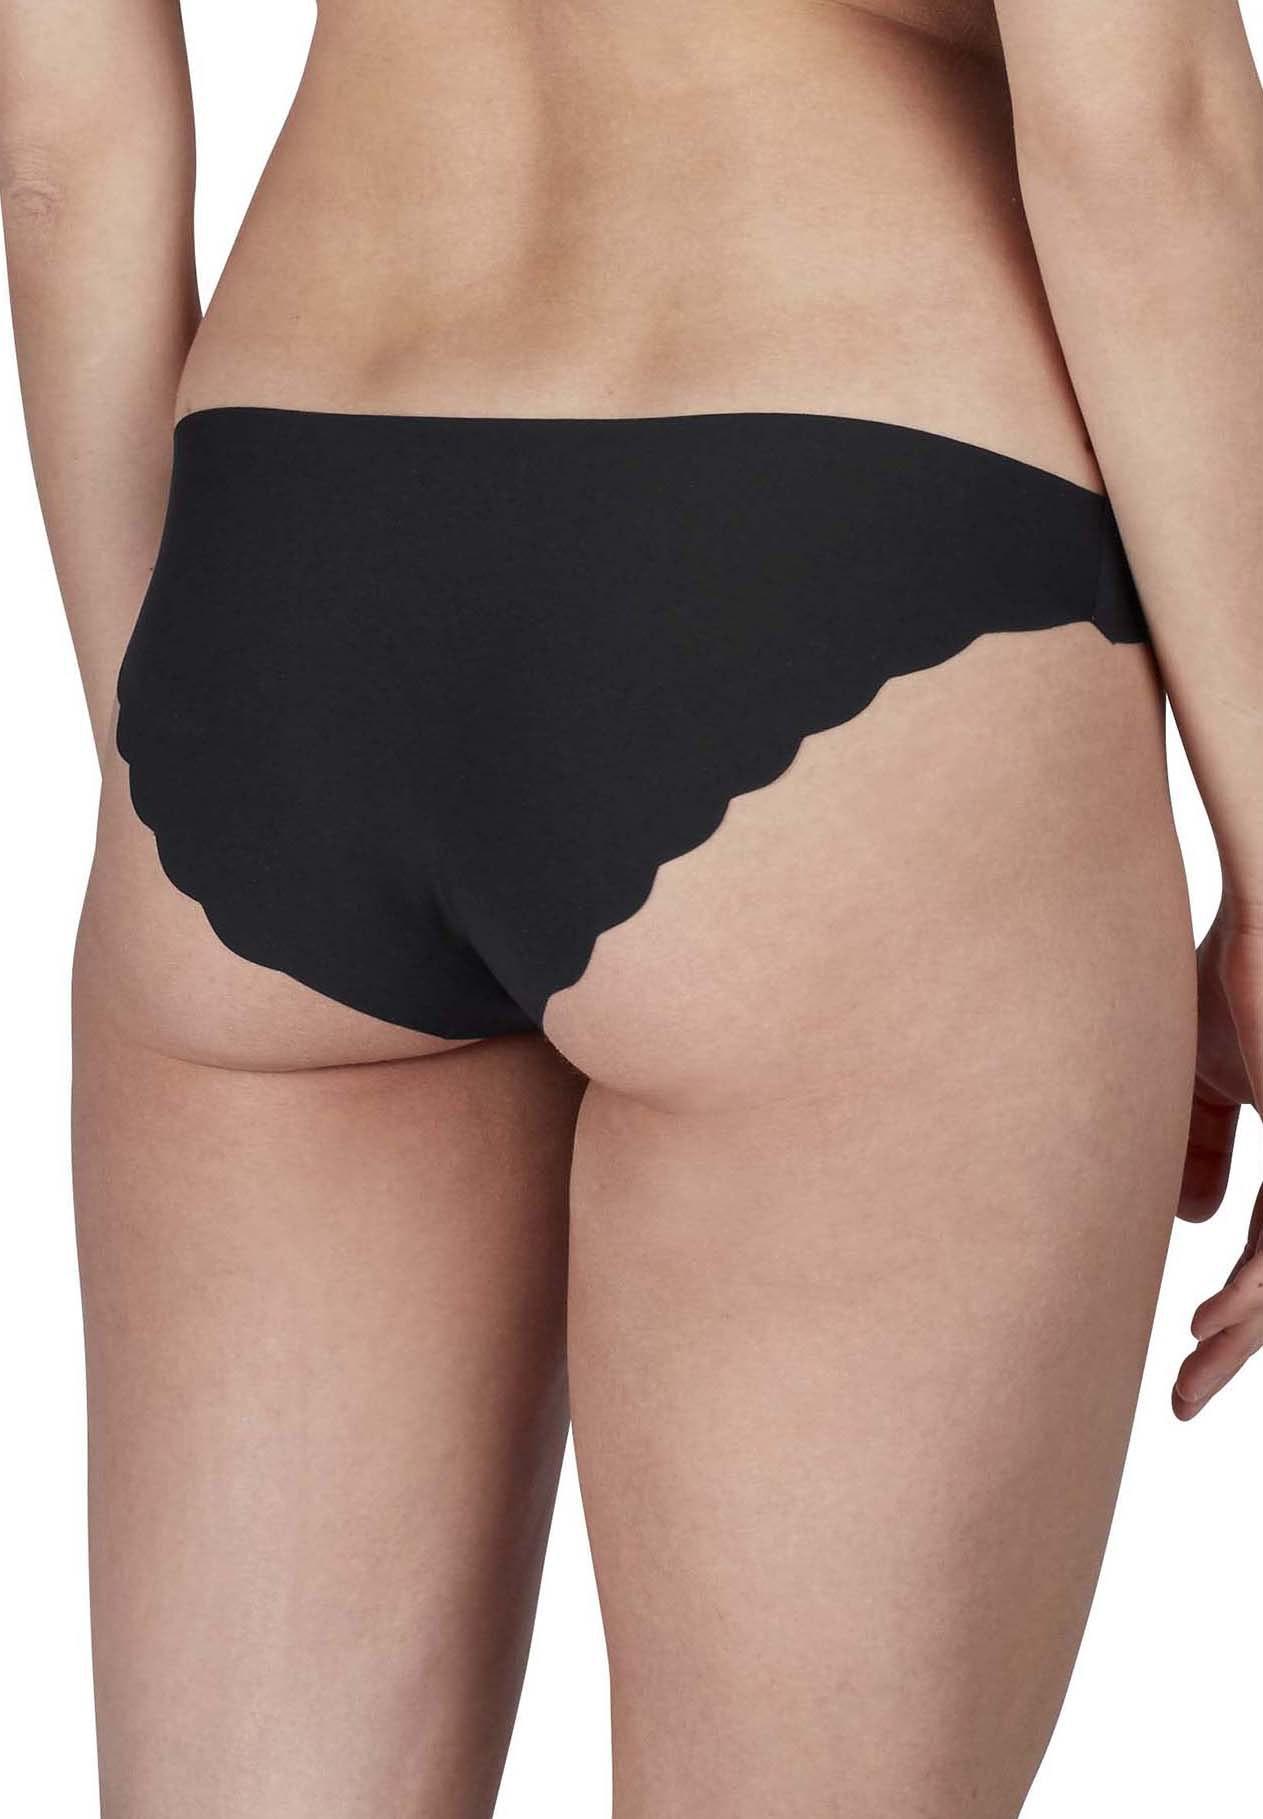 Skiny Damen Rio Slip, Micro Lovers, 2 Stück, Bikini Briefs – Bild 11